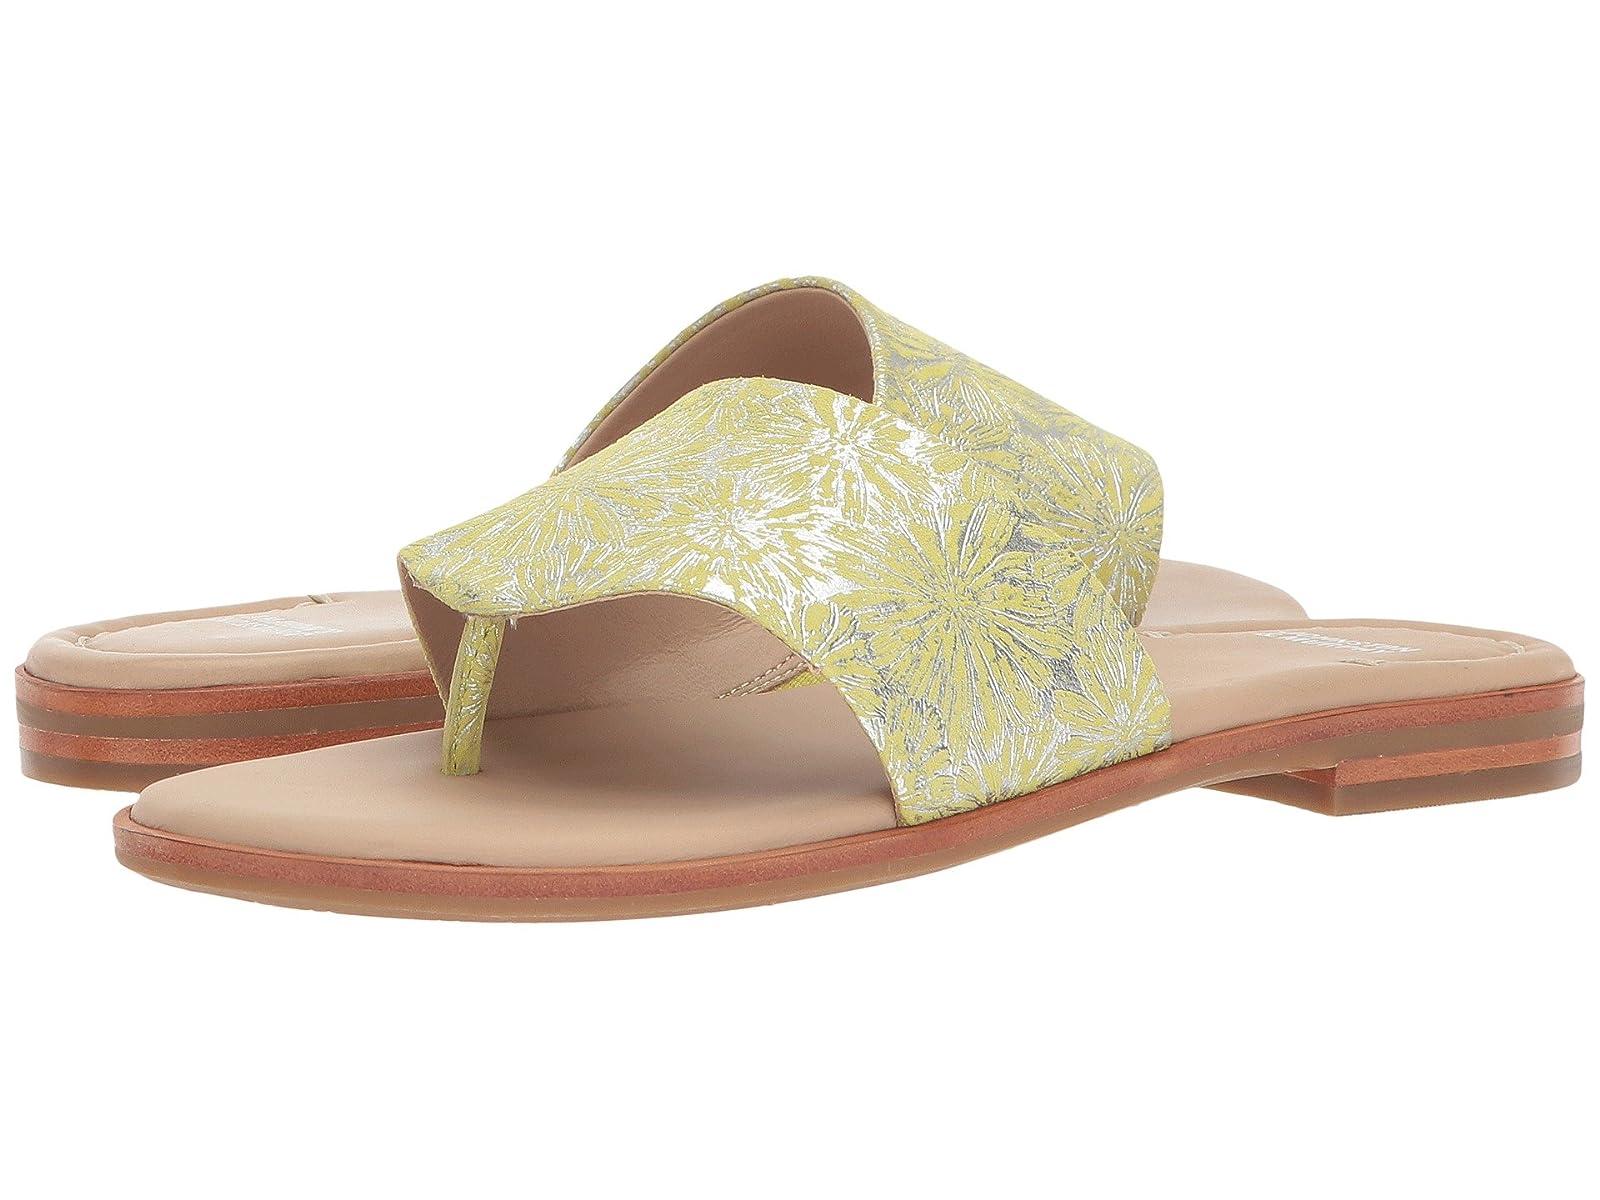 Johnston & Murphy RaneyAtmospheric grades have affordable shoes